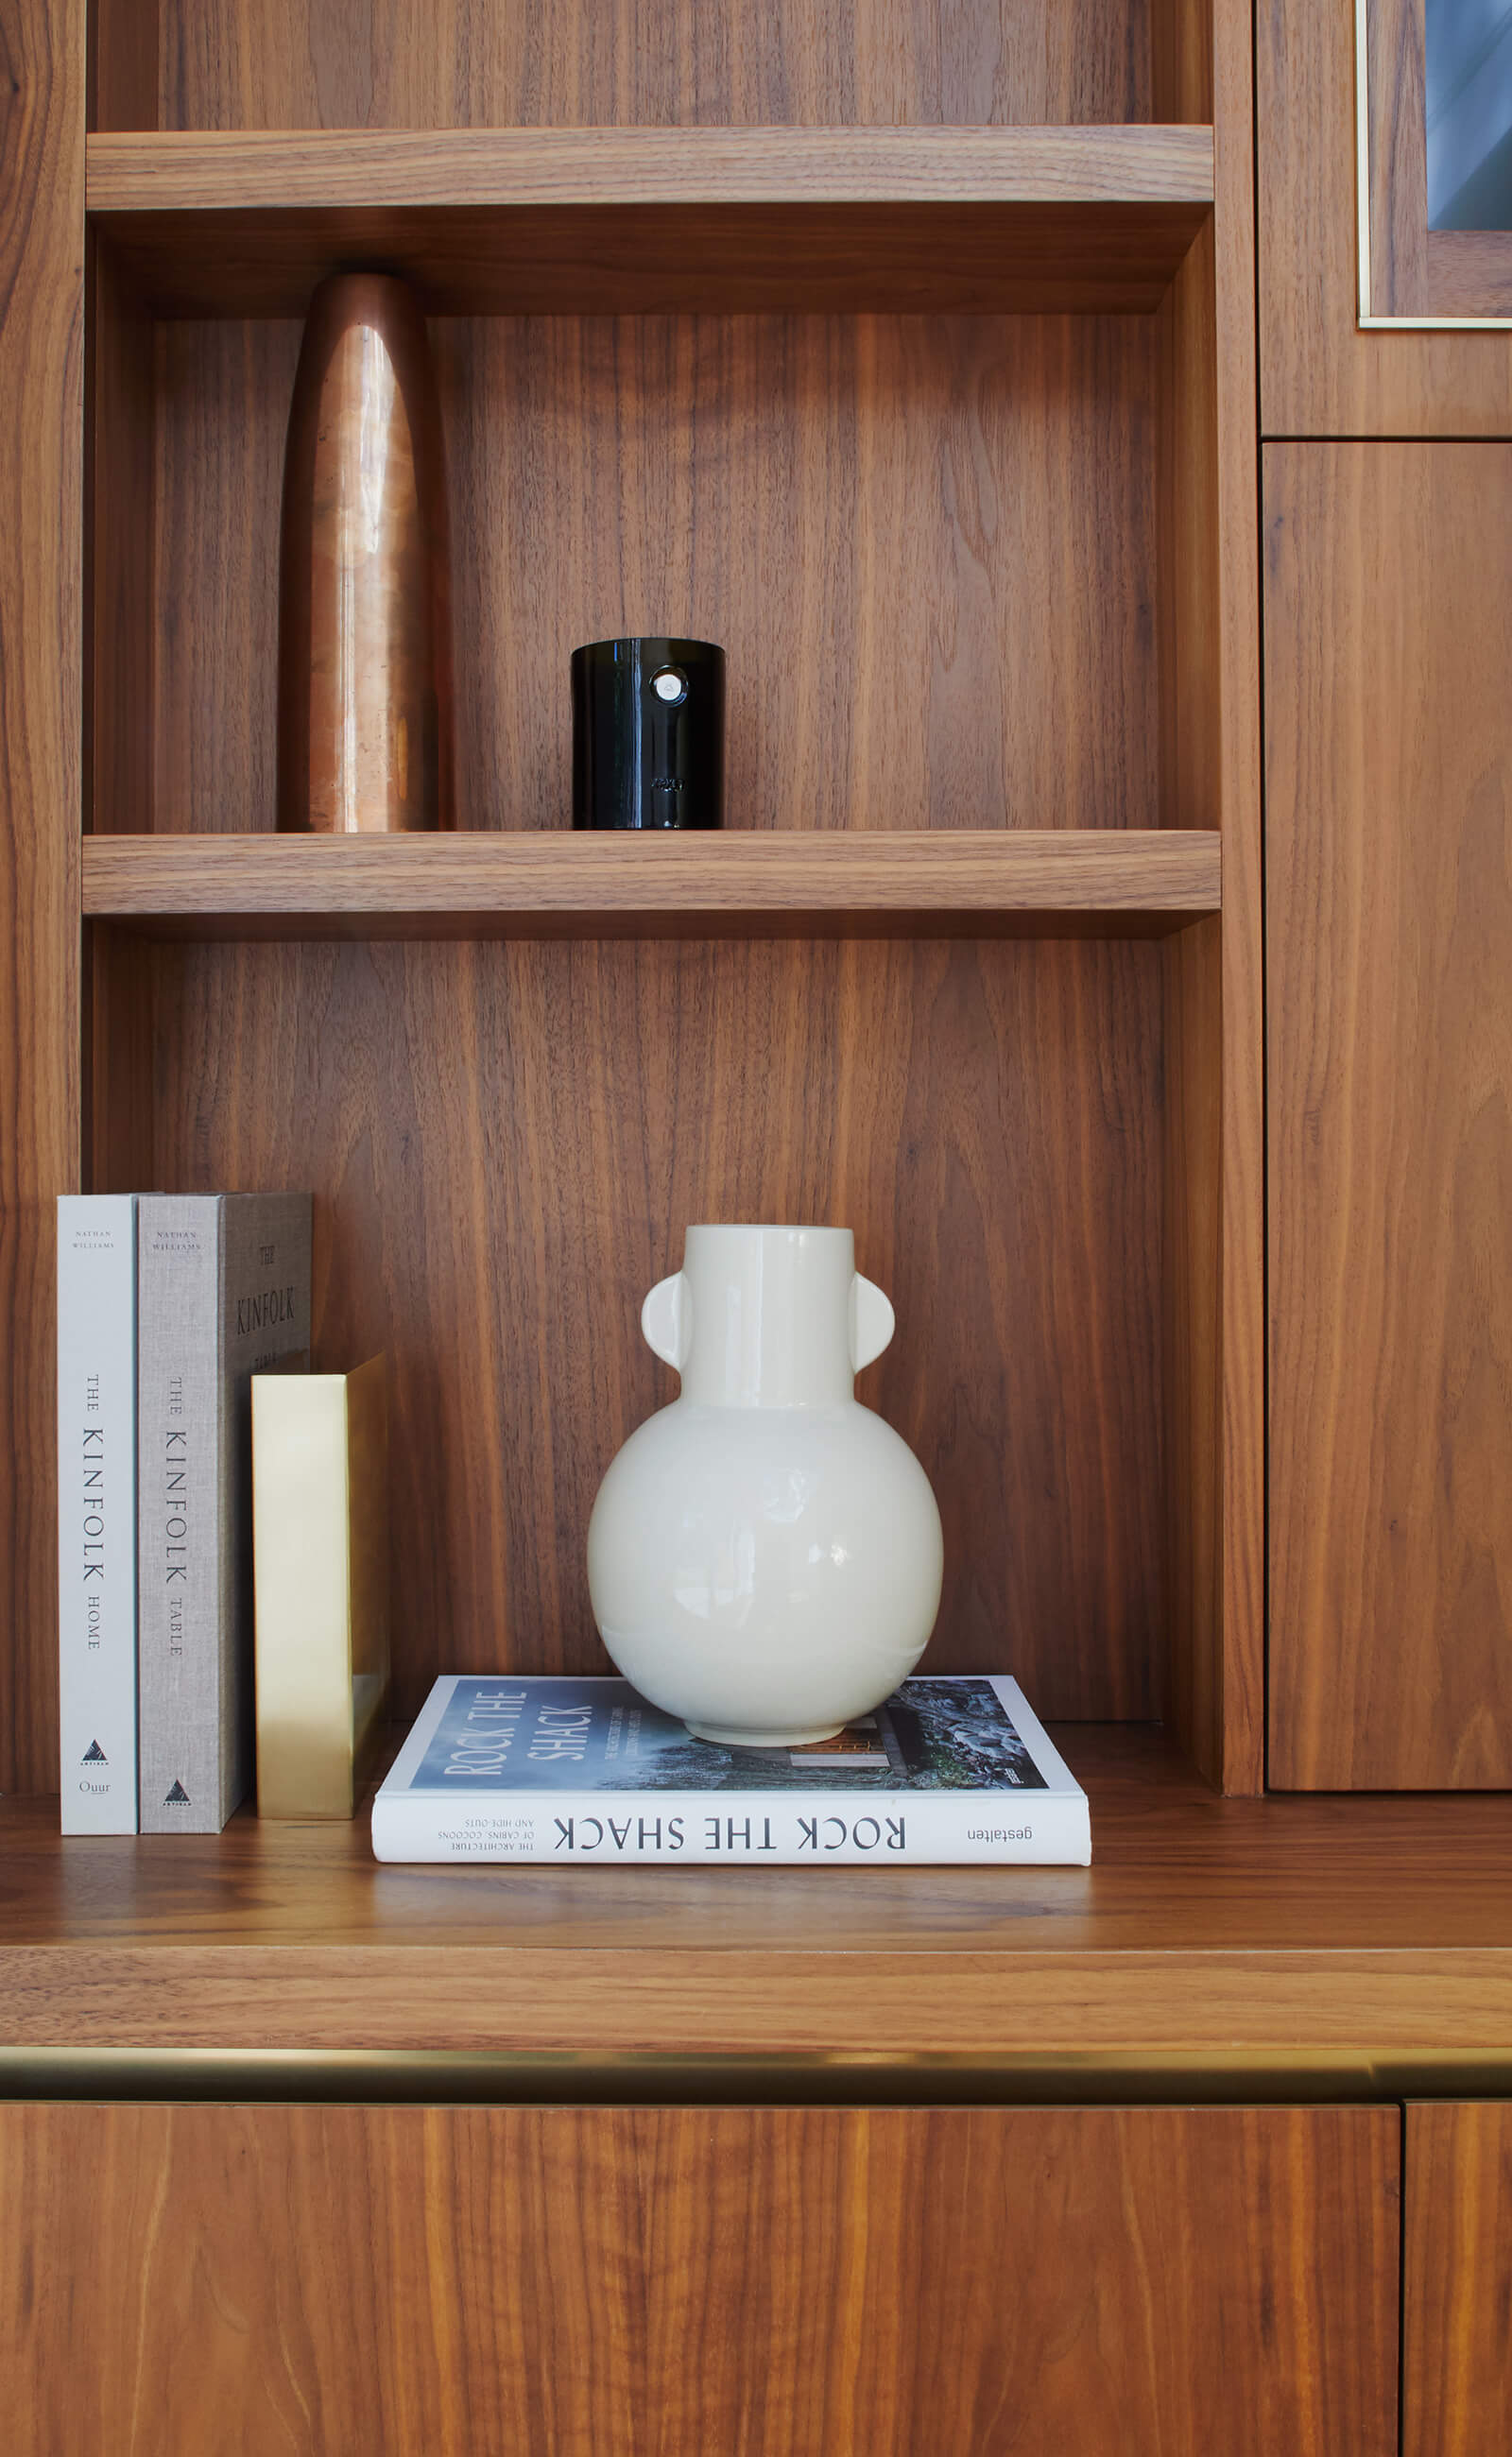 Bespoke walnut cabinetry with brass detail by Splinterworks